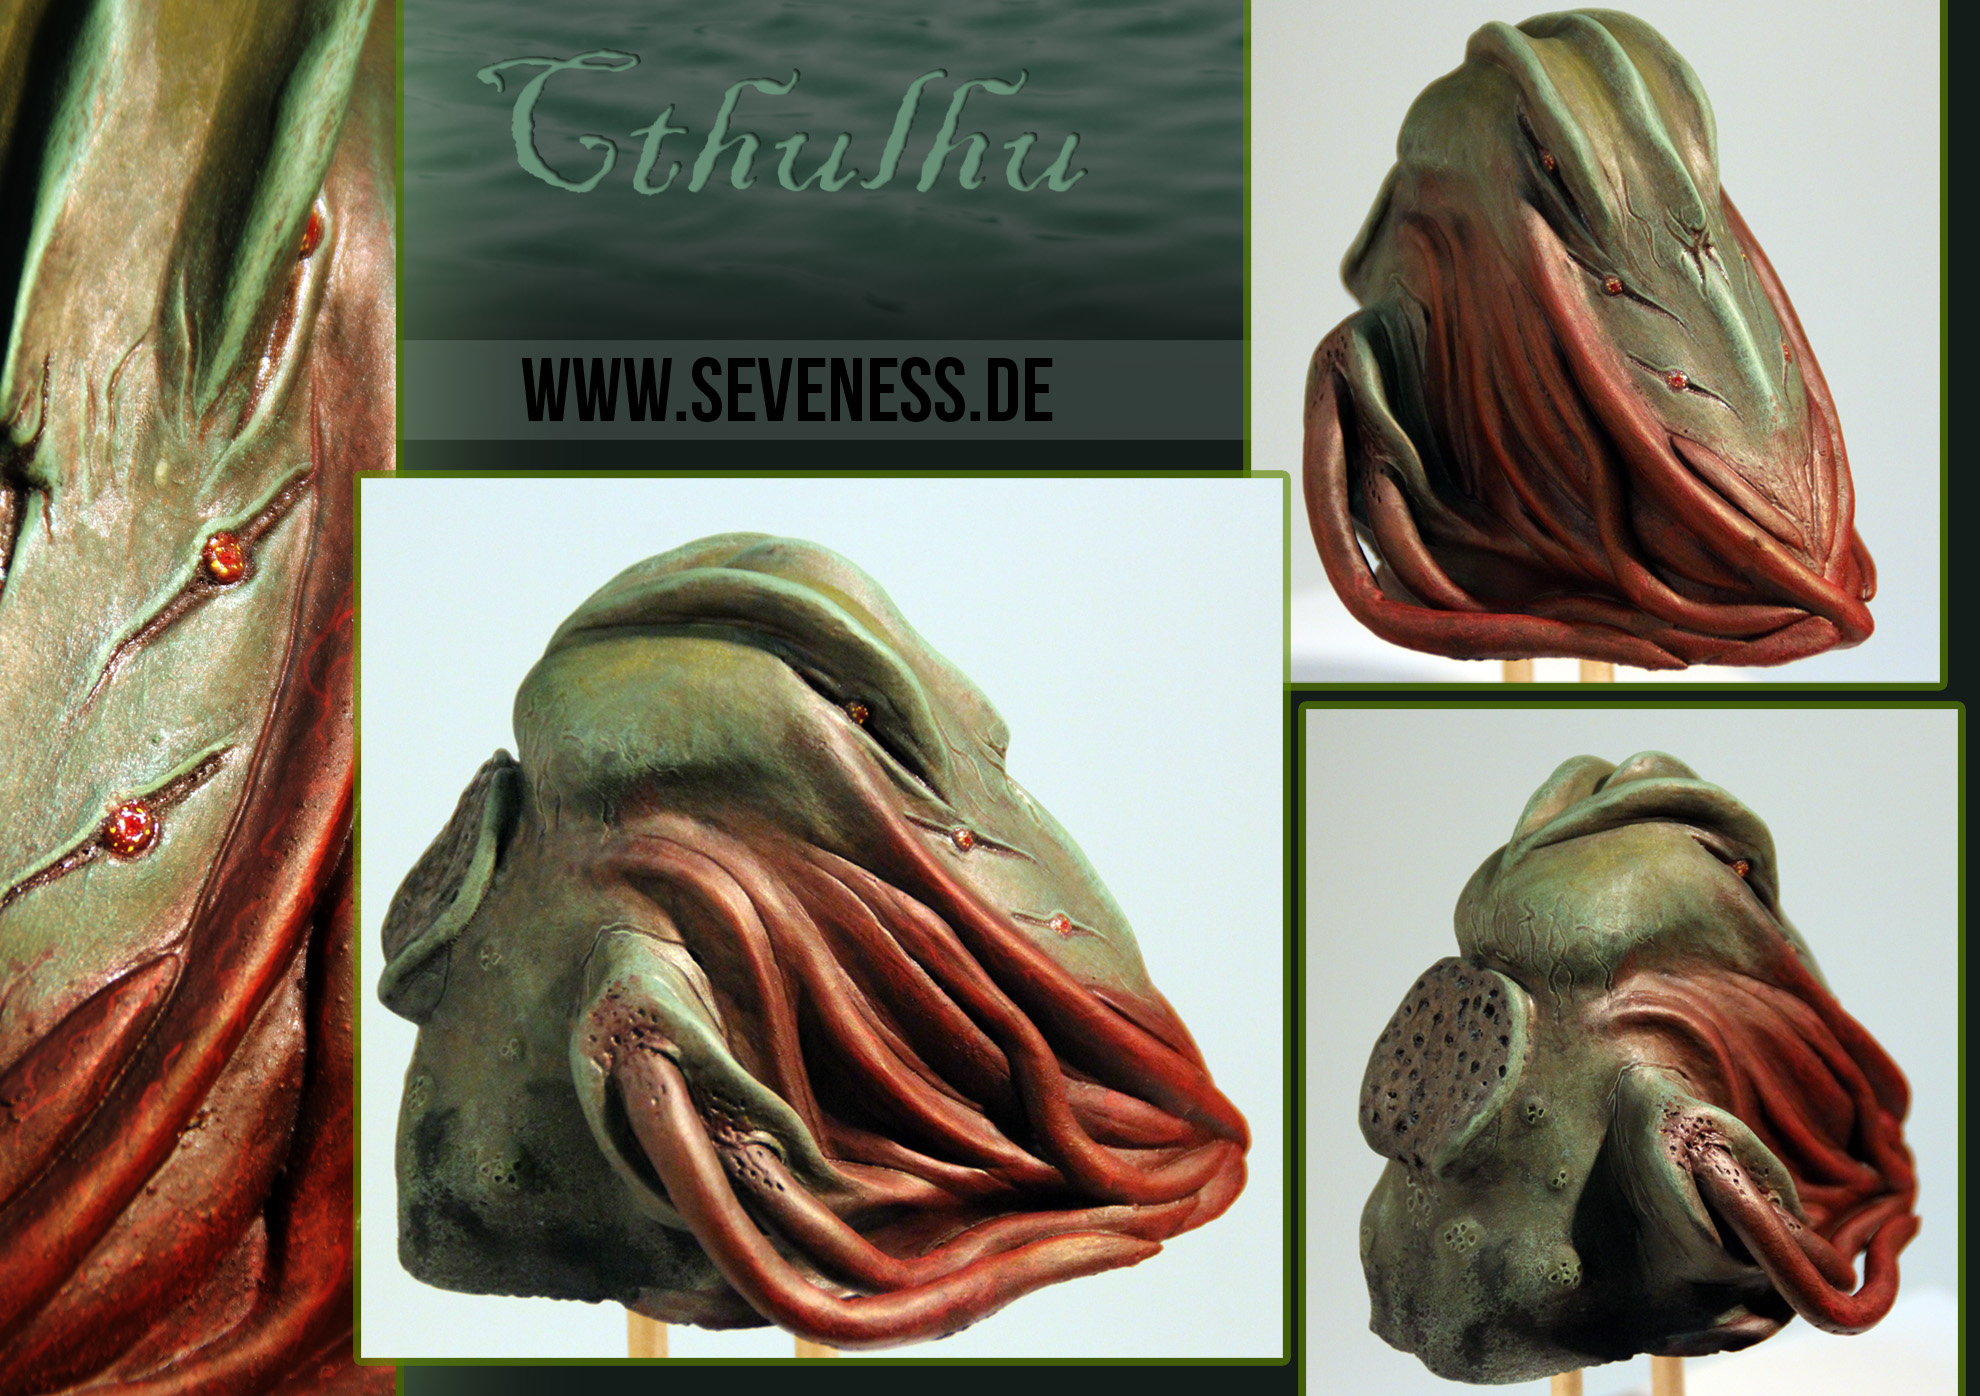 cthulhu II by SpOoKy777